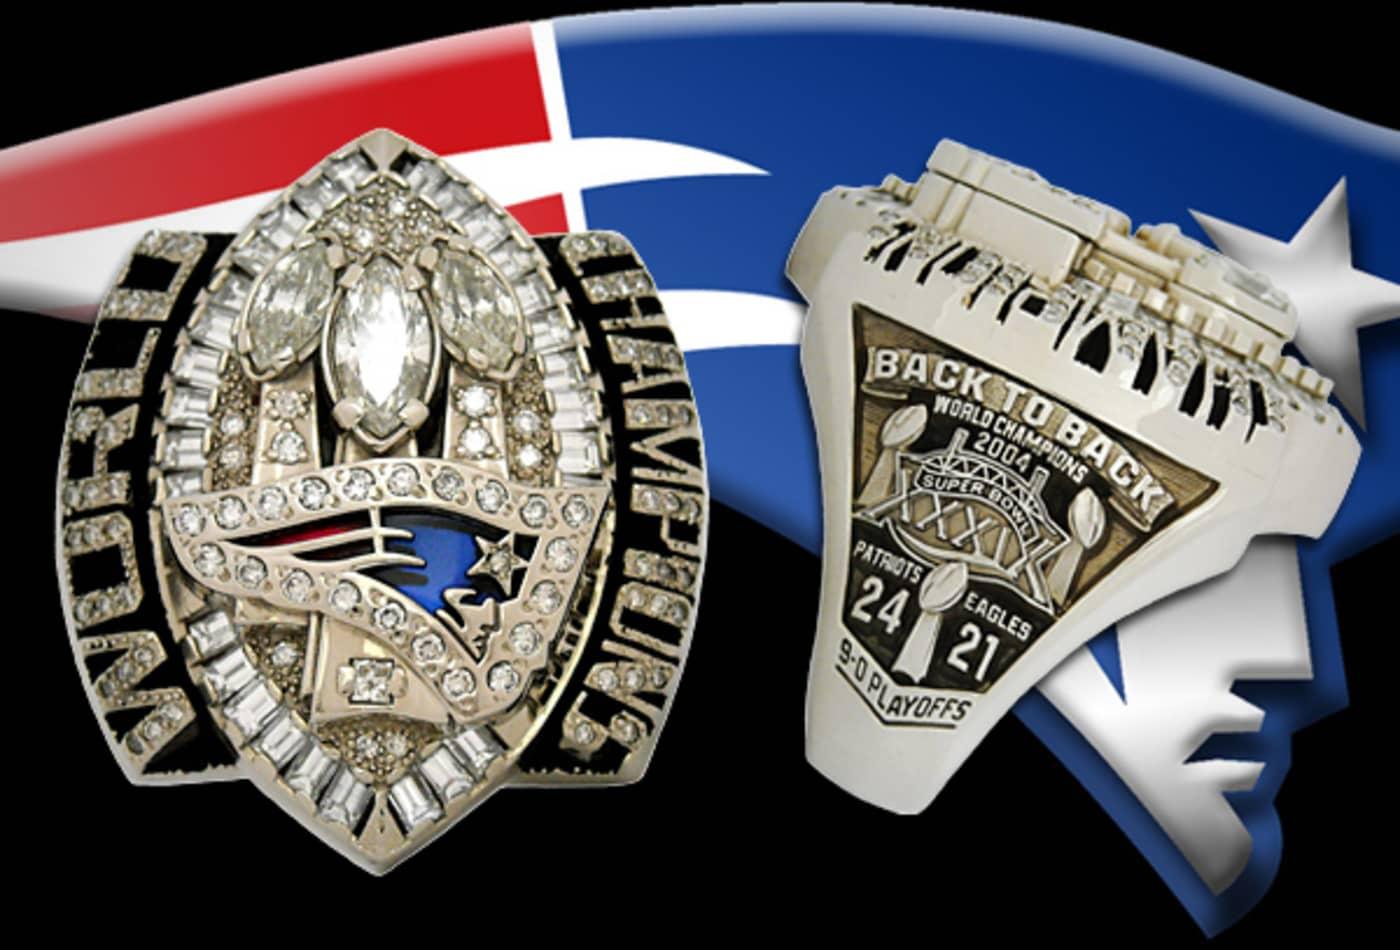 superbowl-rings-2004-new-england-patriots.jpg